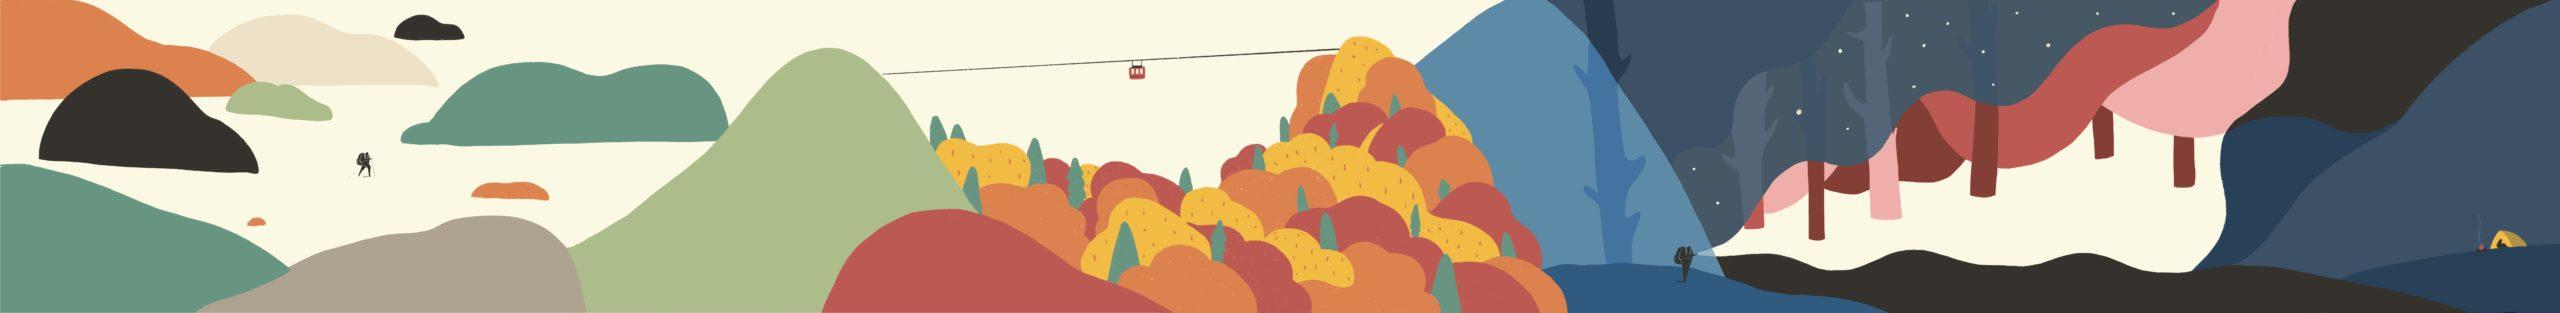 A-Journey_Illustration_03